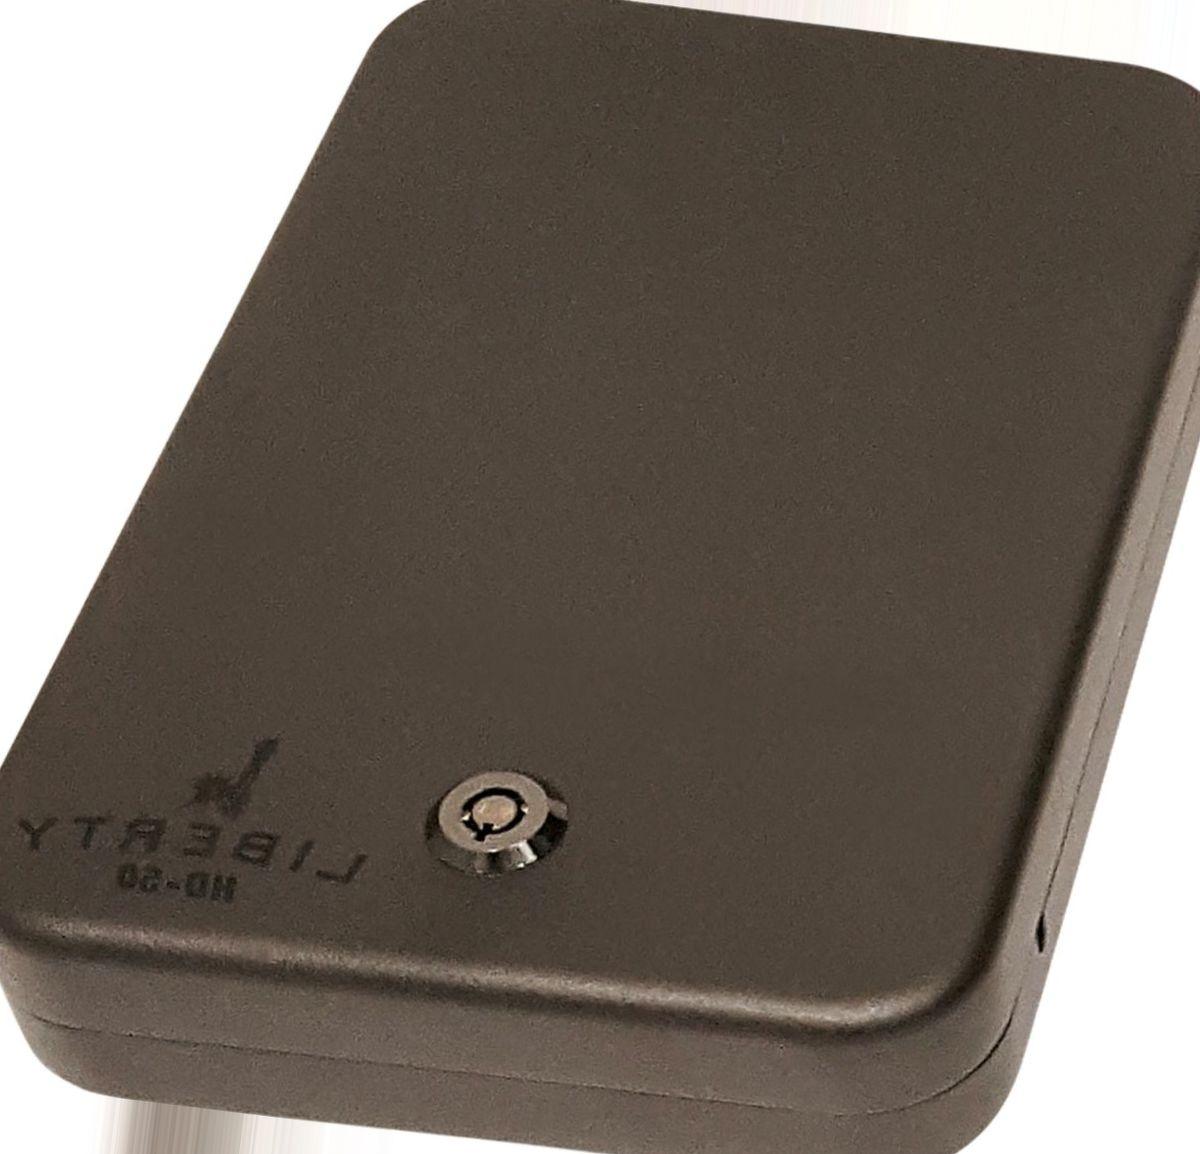 Liberty HDX-250 Bronze Smart Vault with HD-50 Key Vault